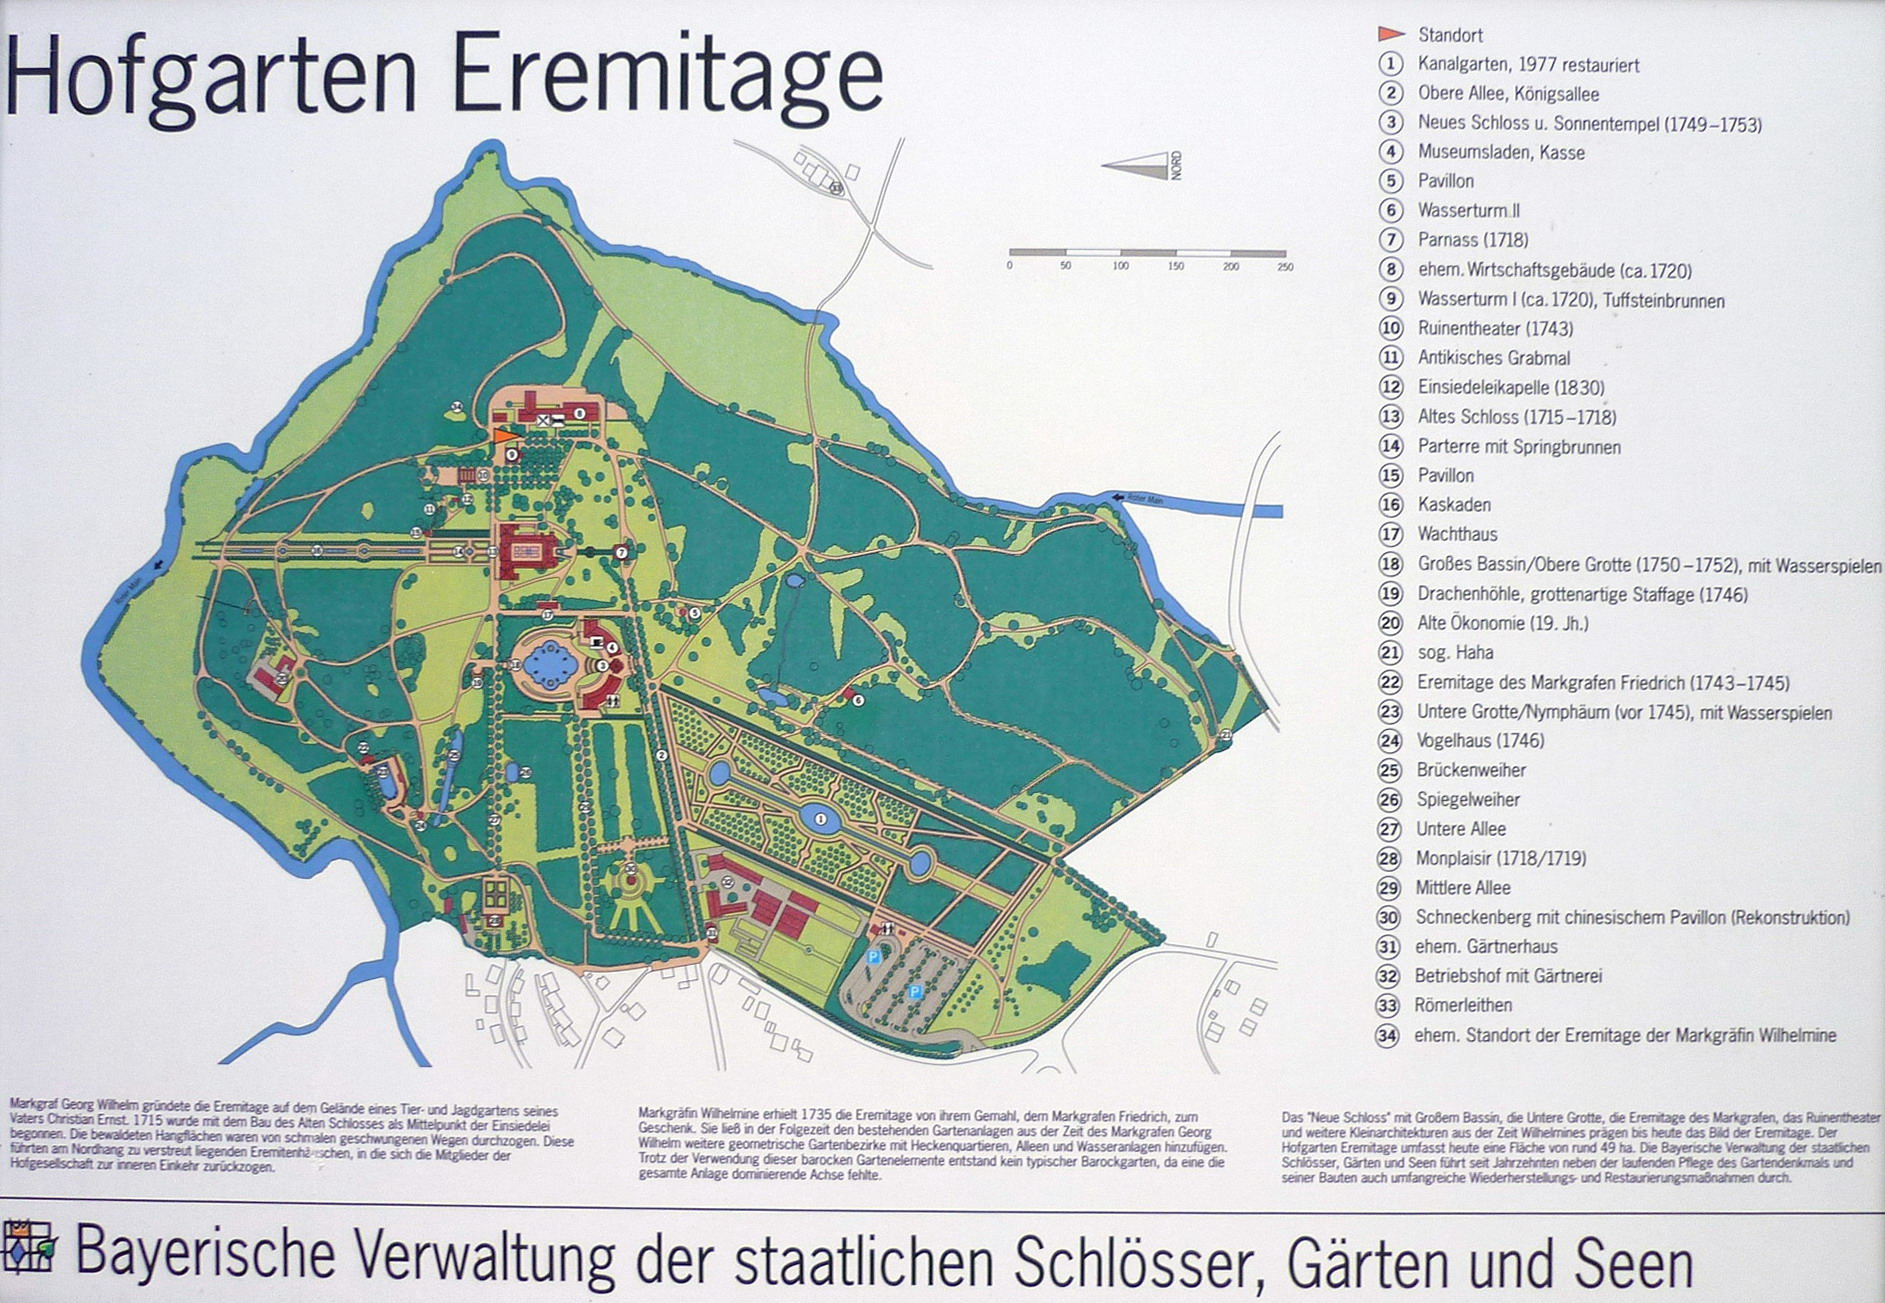 karte bayreuth File:Bayreuth, Eremitage, Karte.   Wikimedia Commons karte bayreuth